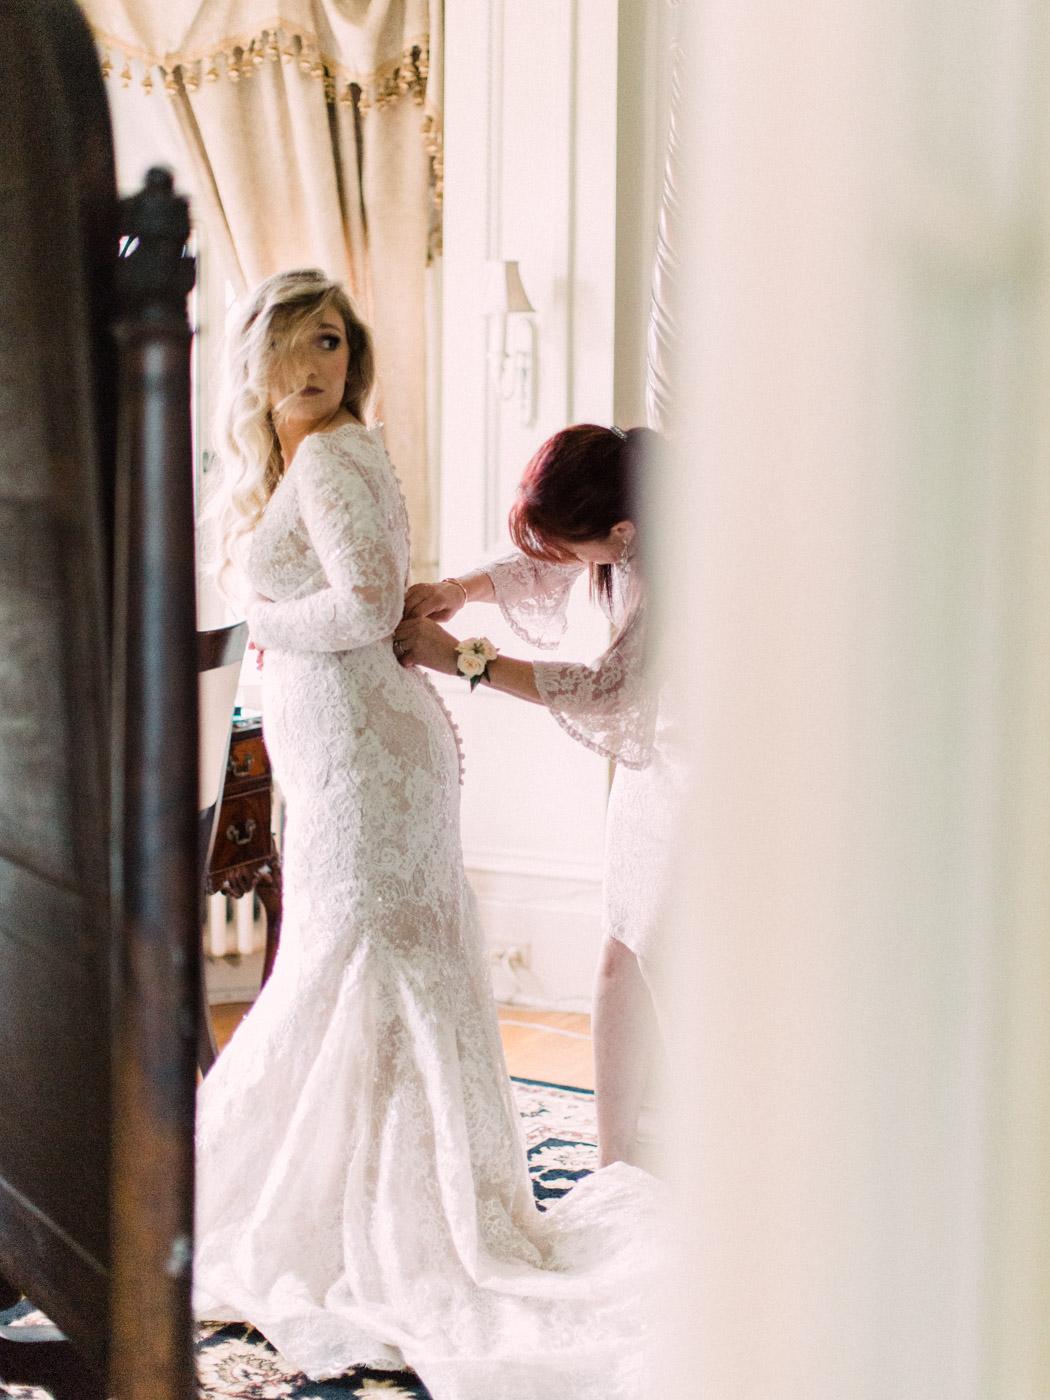 Toronto-wedding-photographer-intimate-classic-fine-art-elopement-ottawa19.jpg